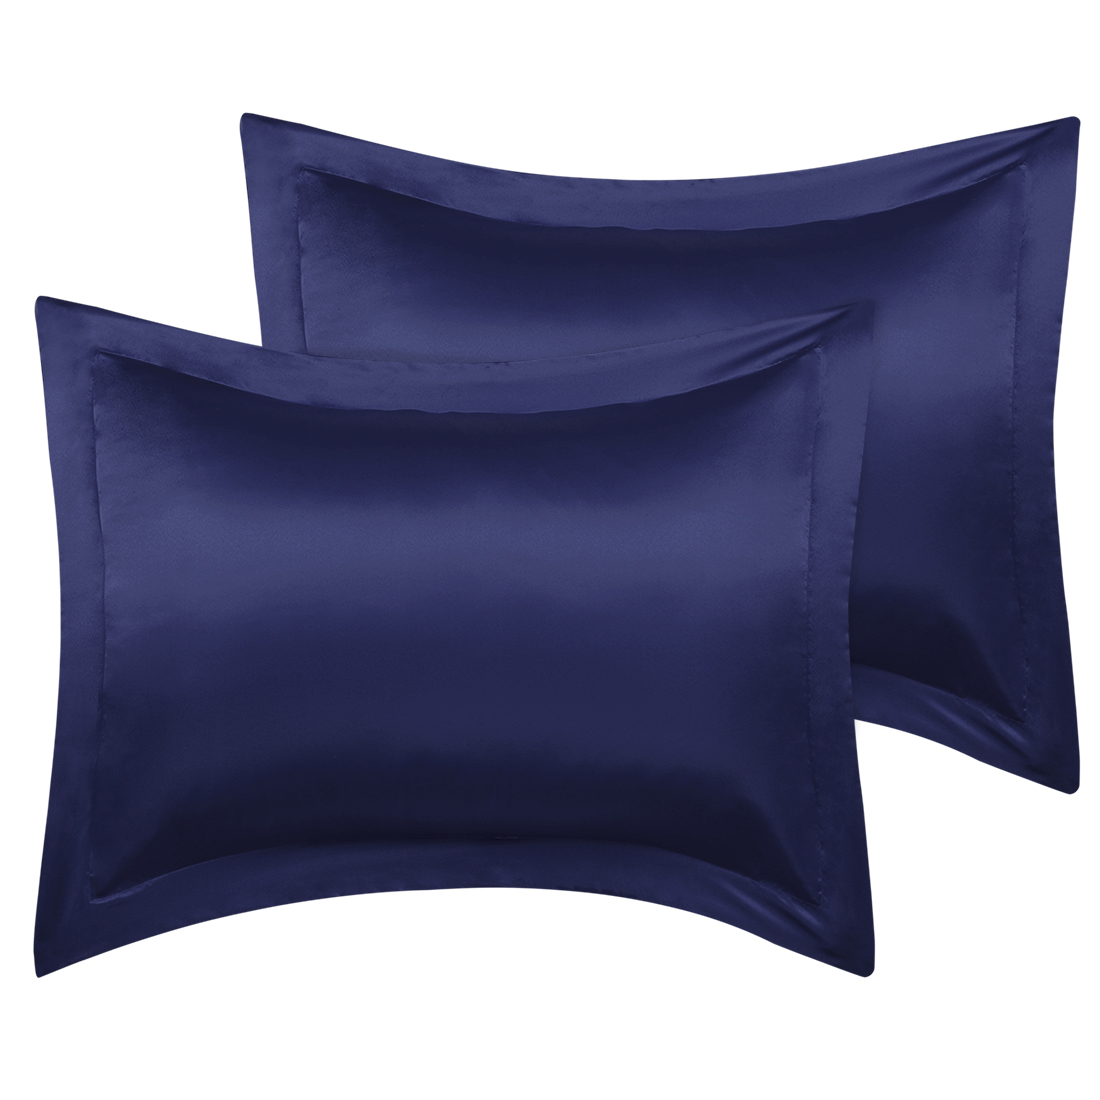 2 Pcs Navy Pillow Shams Satin Pillow Cases Boudoir Oxford Pillowcases